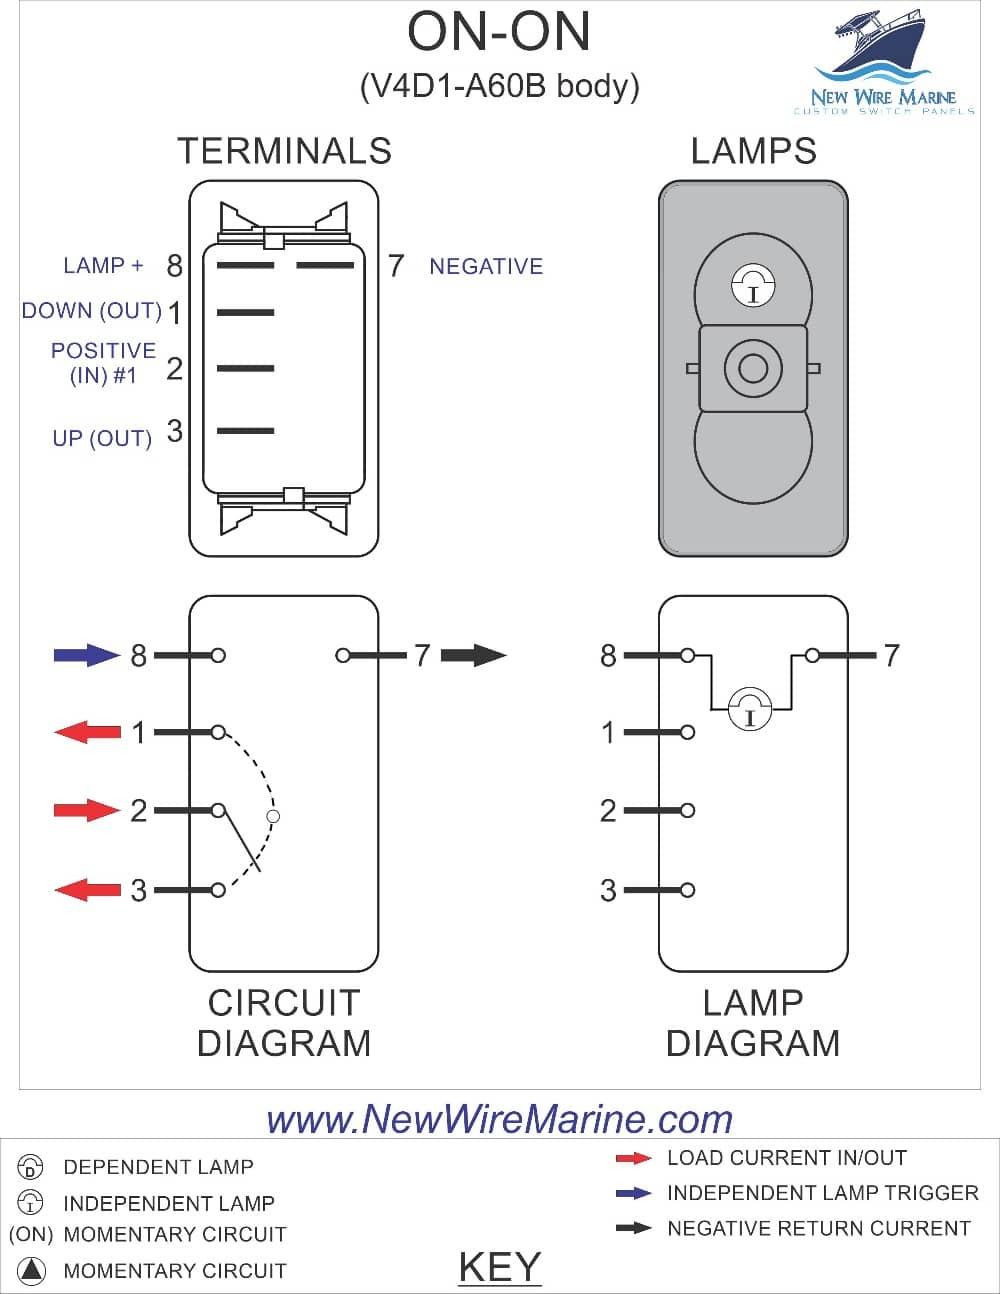 Illuminated Rocker Switch Wiring Diagram - Wiring Diagram Data - 3 Pin Rocker Switch Wiring Diagram